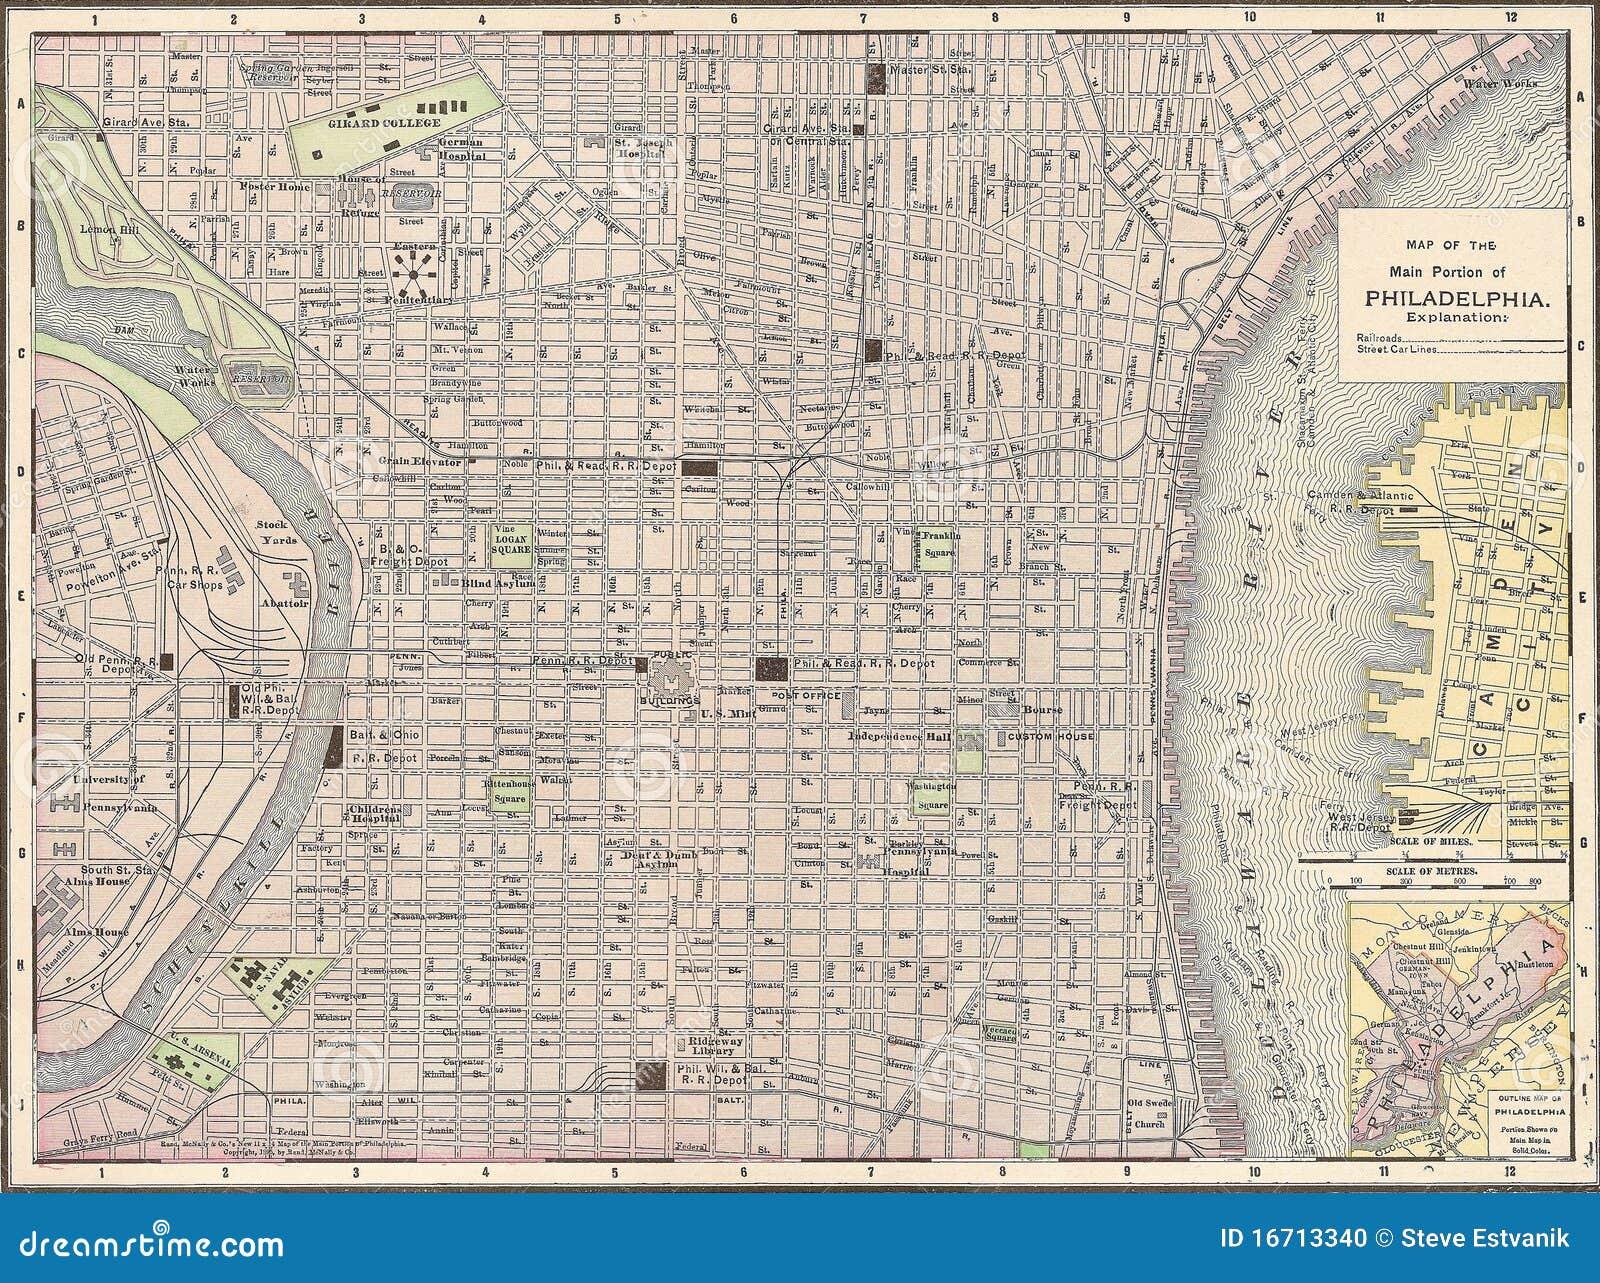 Vintage Philadelphia Map Vintage 1891 Map Of The City Of Philadelphia Stock Photo   Image